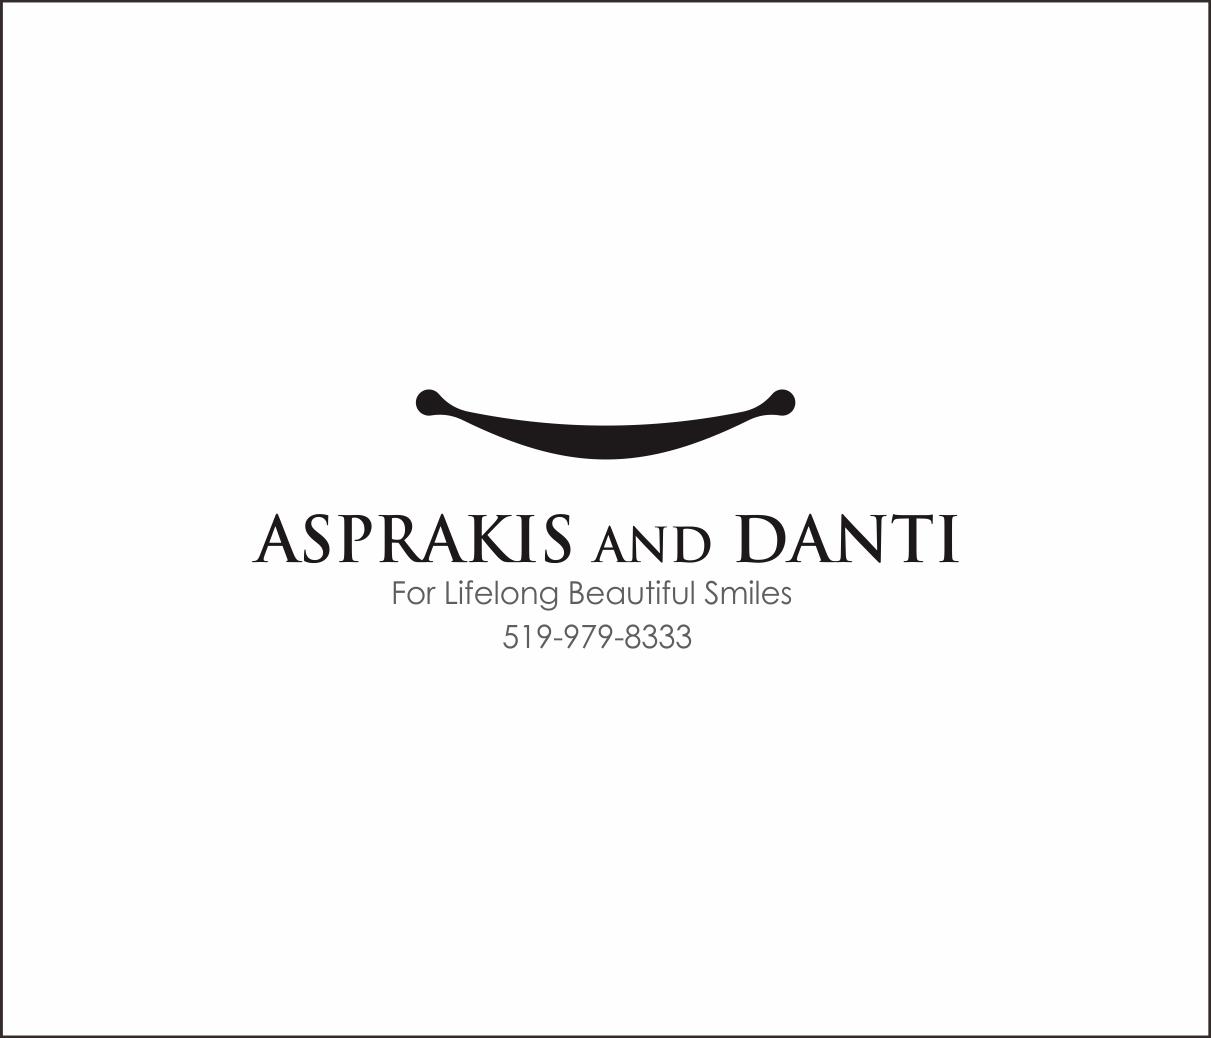 Logo Design by Armada Jamaluddin - Entry No. 113 in the Logo Design Contest Unique Logo Design Wanted for Asprakis and Danti.